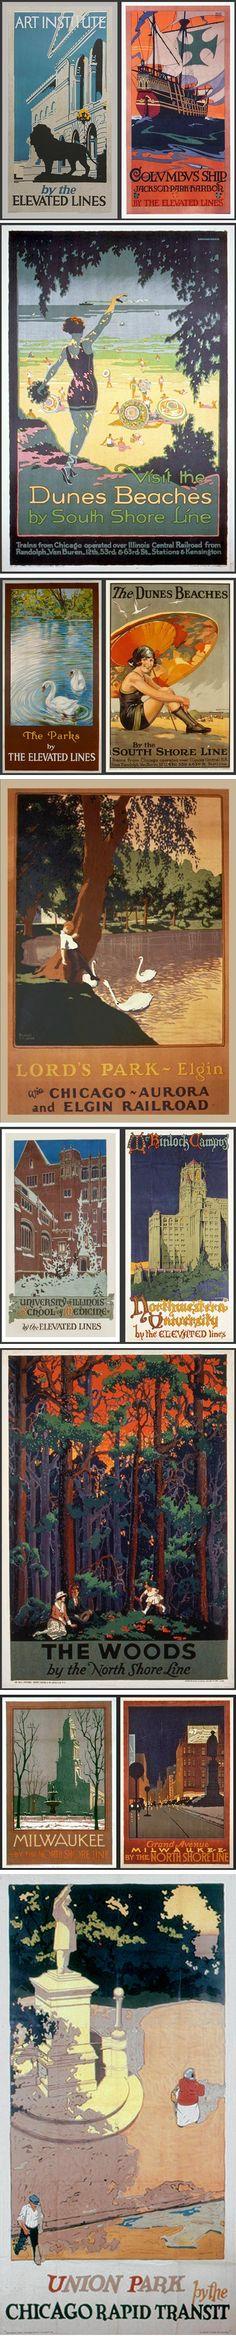 1920's Chicago promotional posters on Imprint: Willard Frederic Elmes, Otto Brennemann, Hazel B. Urgelles, Norman Erickson, Oscar Rabe Hanson, Robert Beebe, Arthur A. Johnson, Willard Frederic Elmes